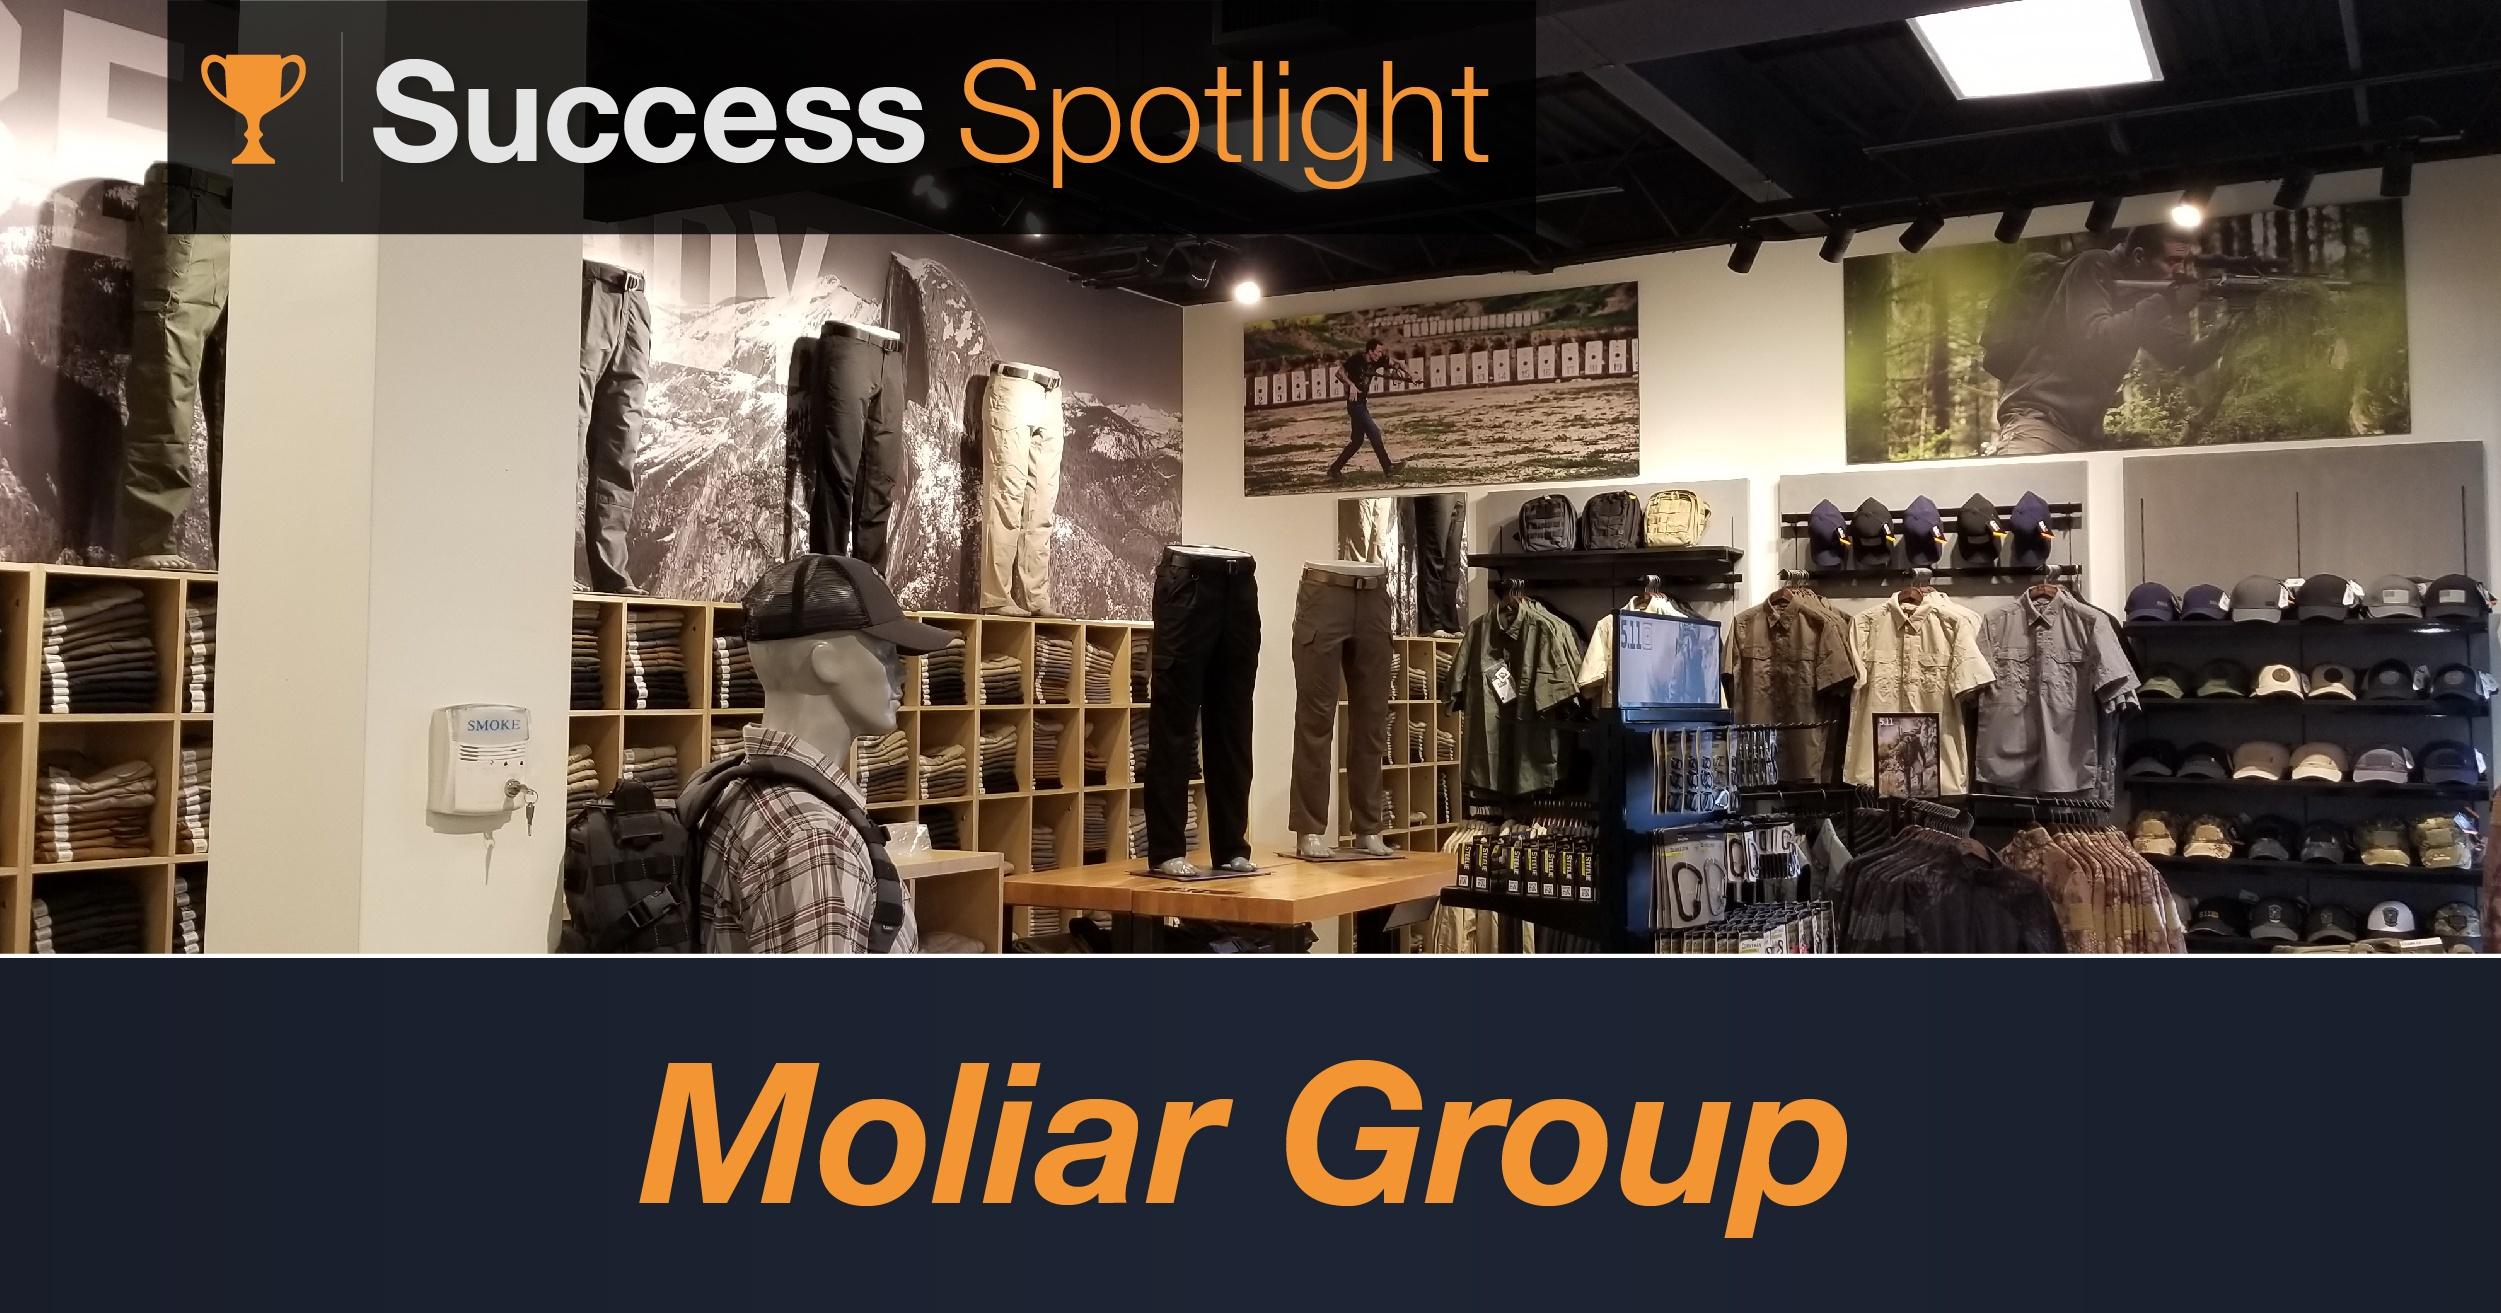 Success Spotlight: Moliar Group